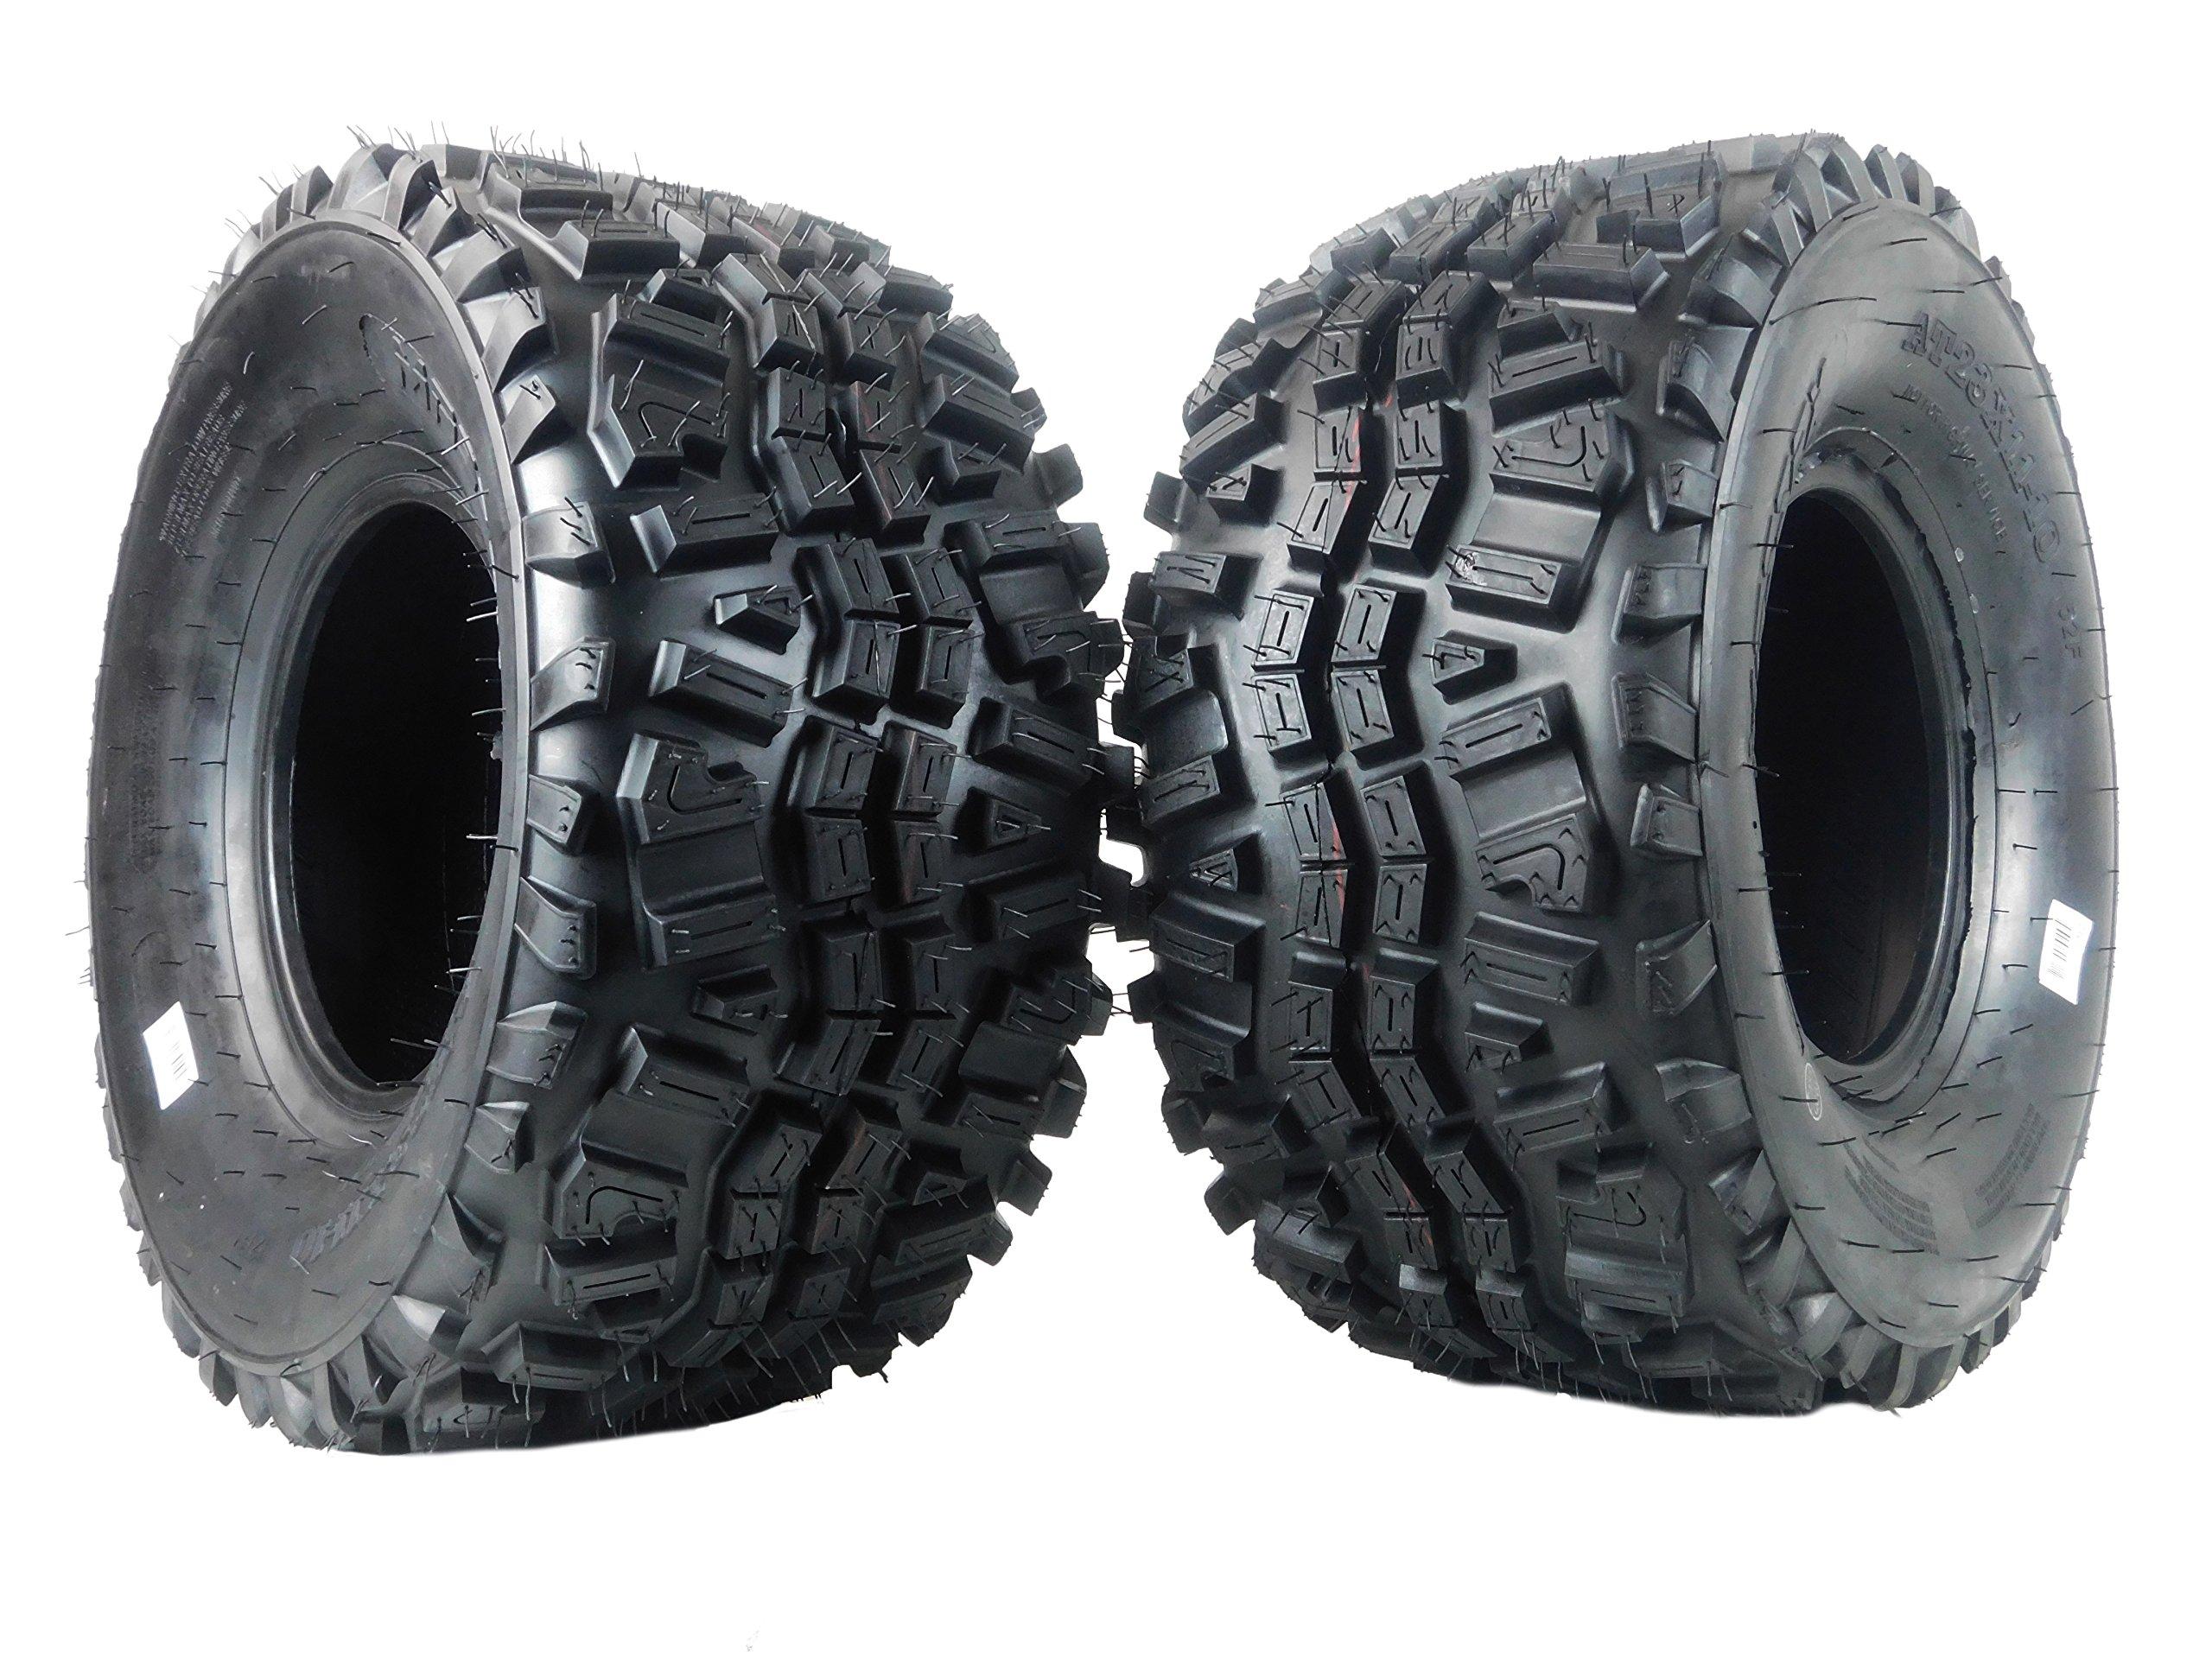 New MASSFX VS231110 ATV Tires 23X11X10 23x11-10 OEM Kawasaki Mule Tires 6 Ply 2 set